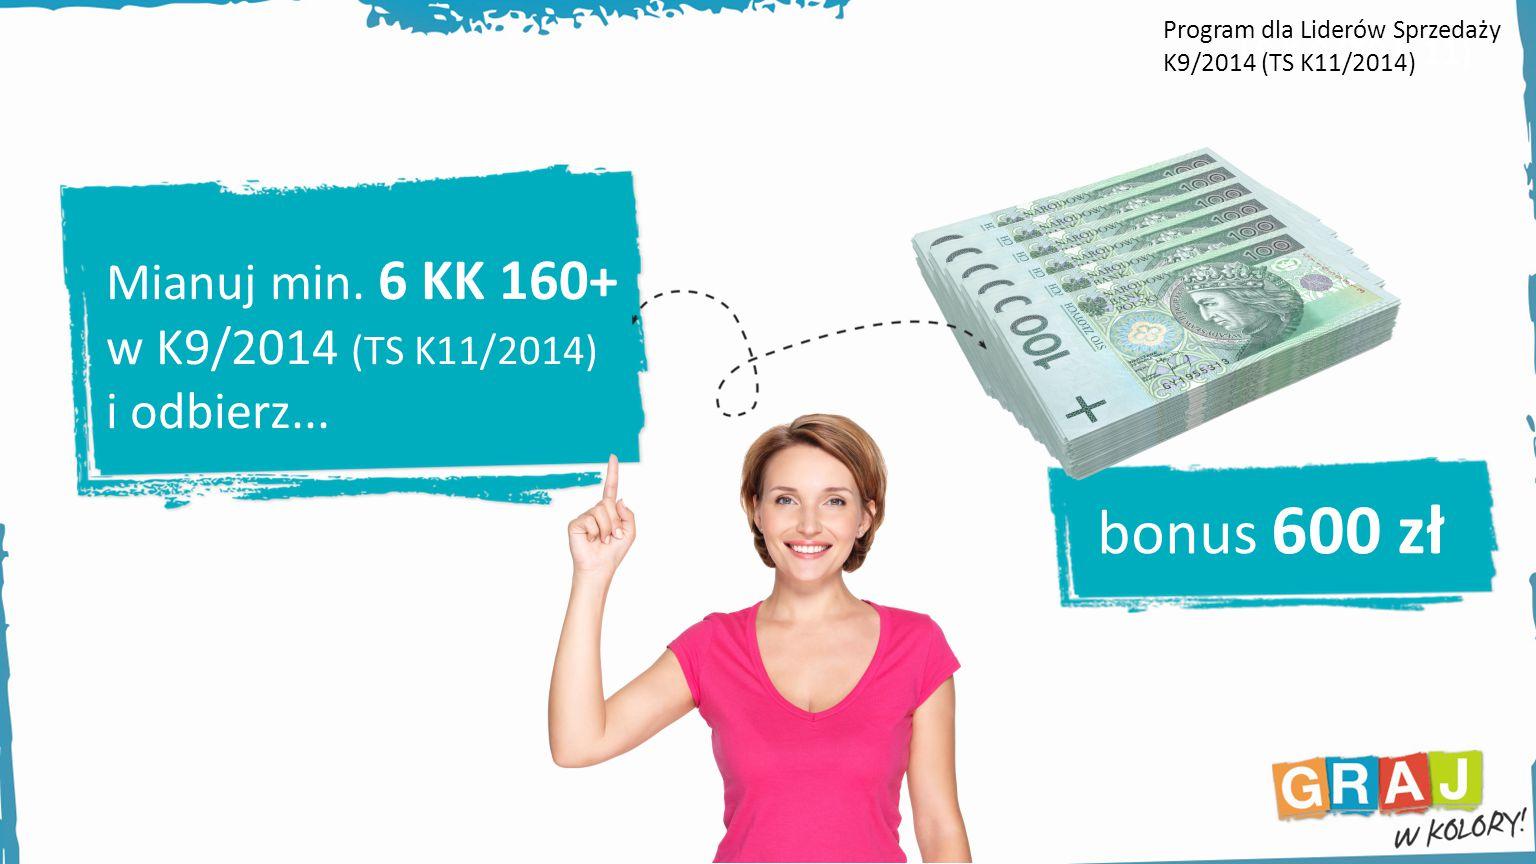 bonus 600 zł Mianuj min. 6 KK 160+ w K9/2014 (TS K11/2014)